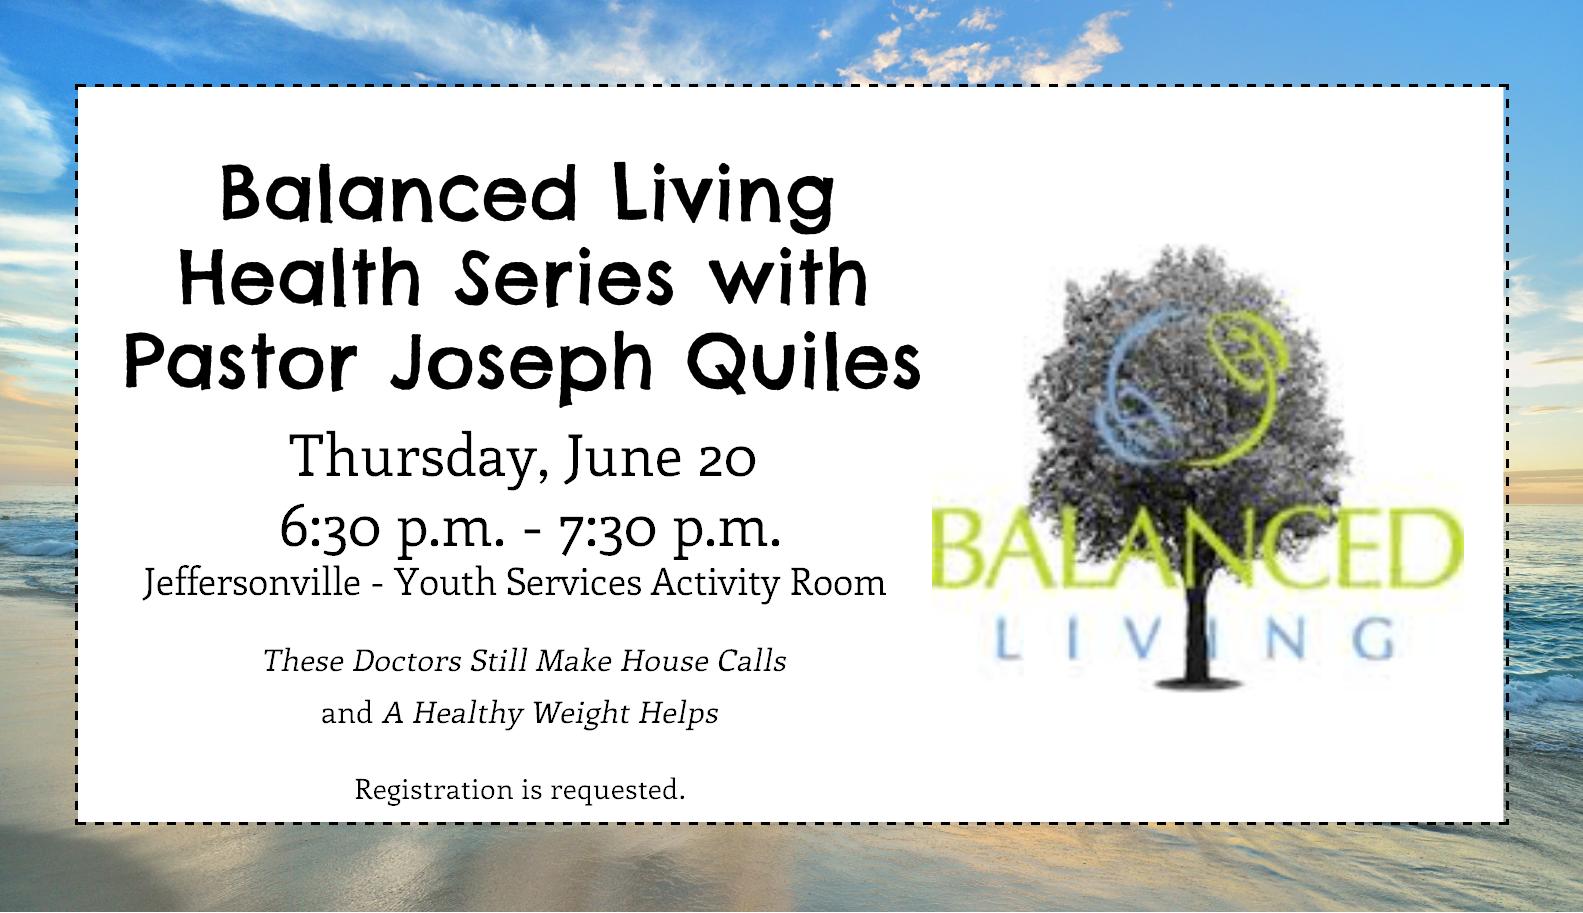 Flyer for monthly Balanced Living program